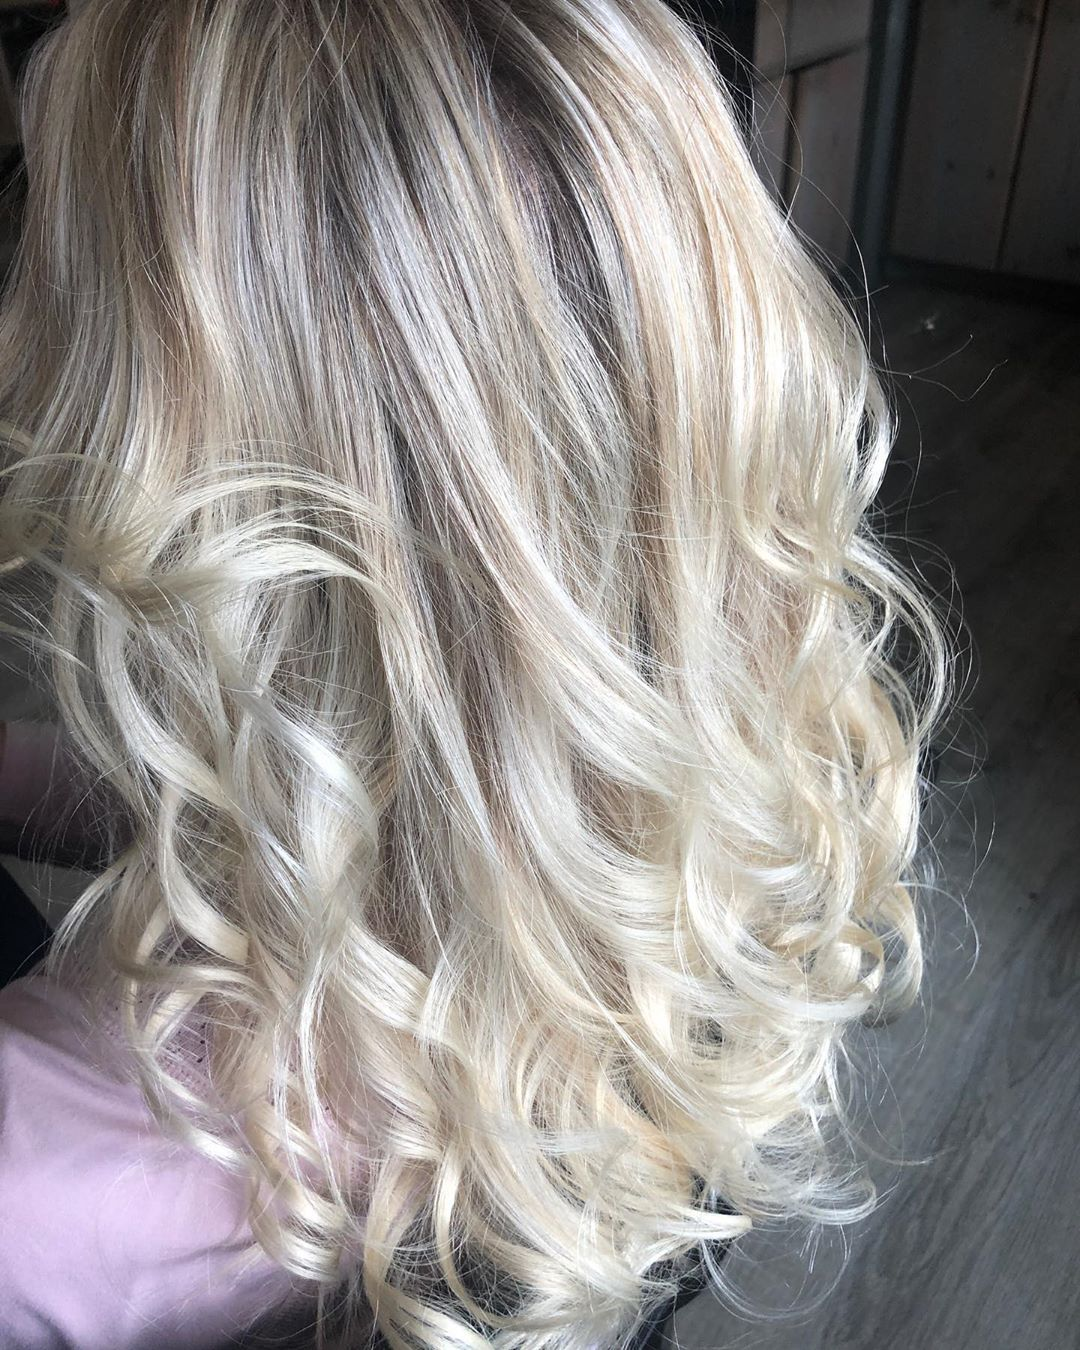 My Magical Blonde Babe that was once a color correction✨ #redken #redkenshadeseq #redkenobsessed #redkenready #redkenflashlift #blondehair #blonde #icyblonde #livedinblonde #dimensionalblonde #coolblonde #highlights #framar #colortrak #hairgoals #hairinspo #hairinspiration #olaplex #saloncentric #ittakesapro #bioionic #behindthechair #modernsalon #nofilter